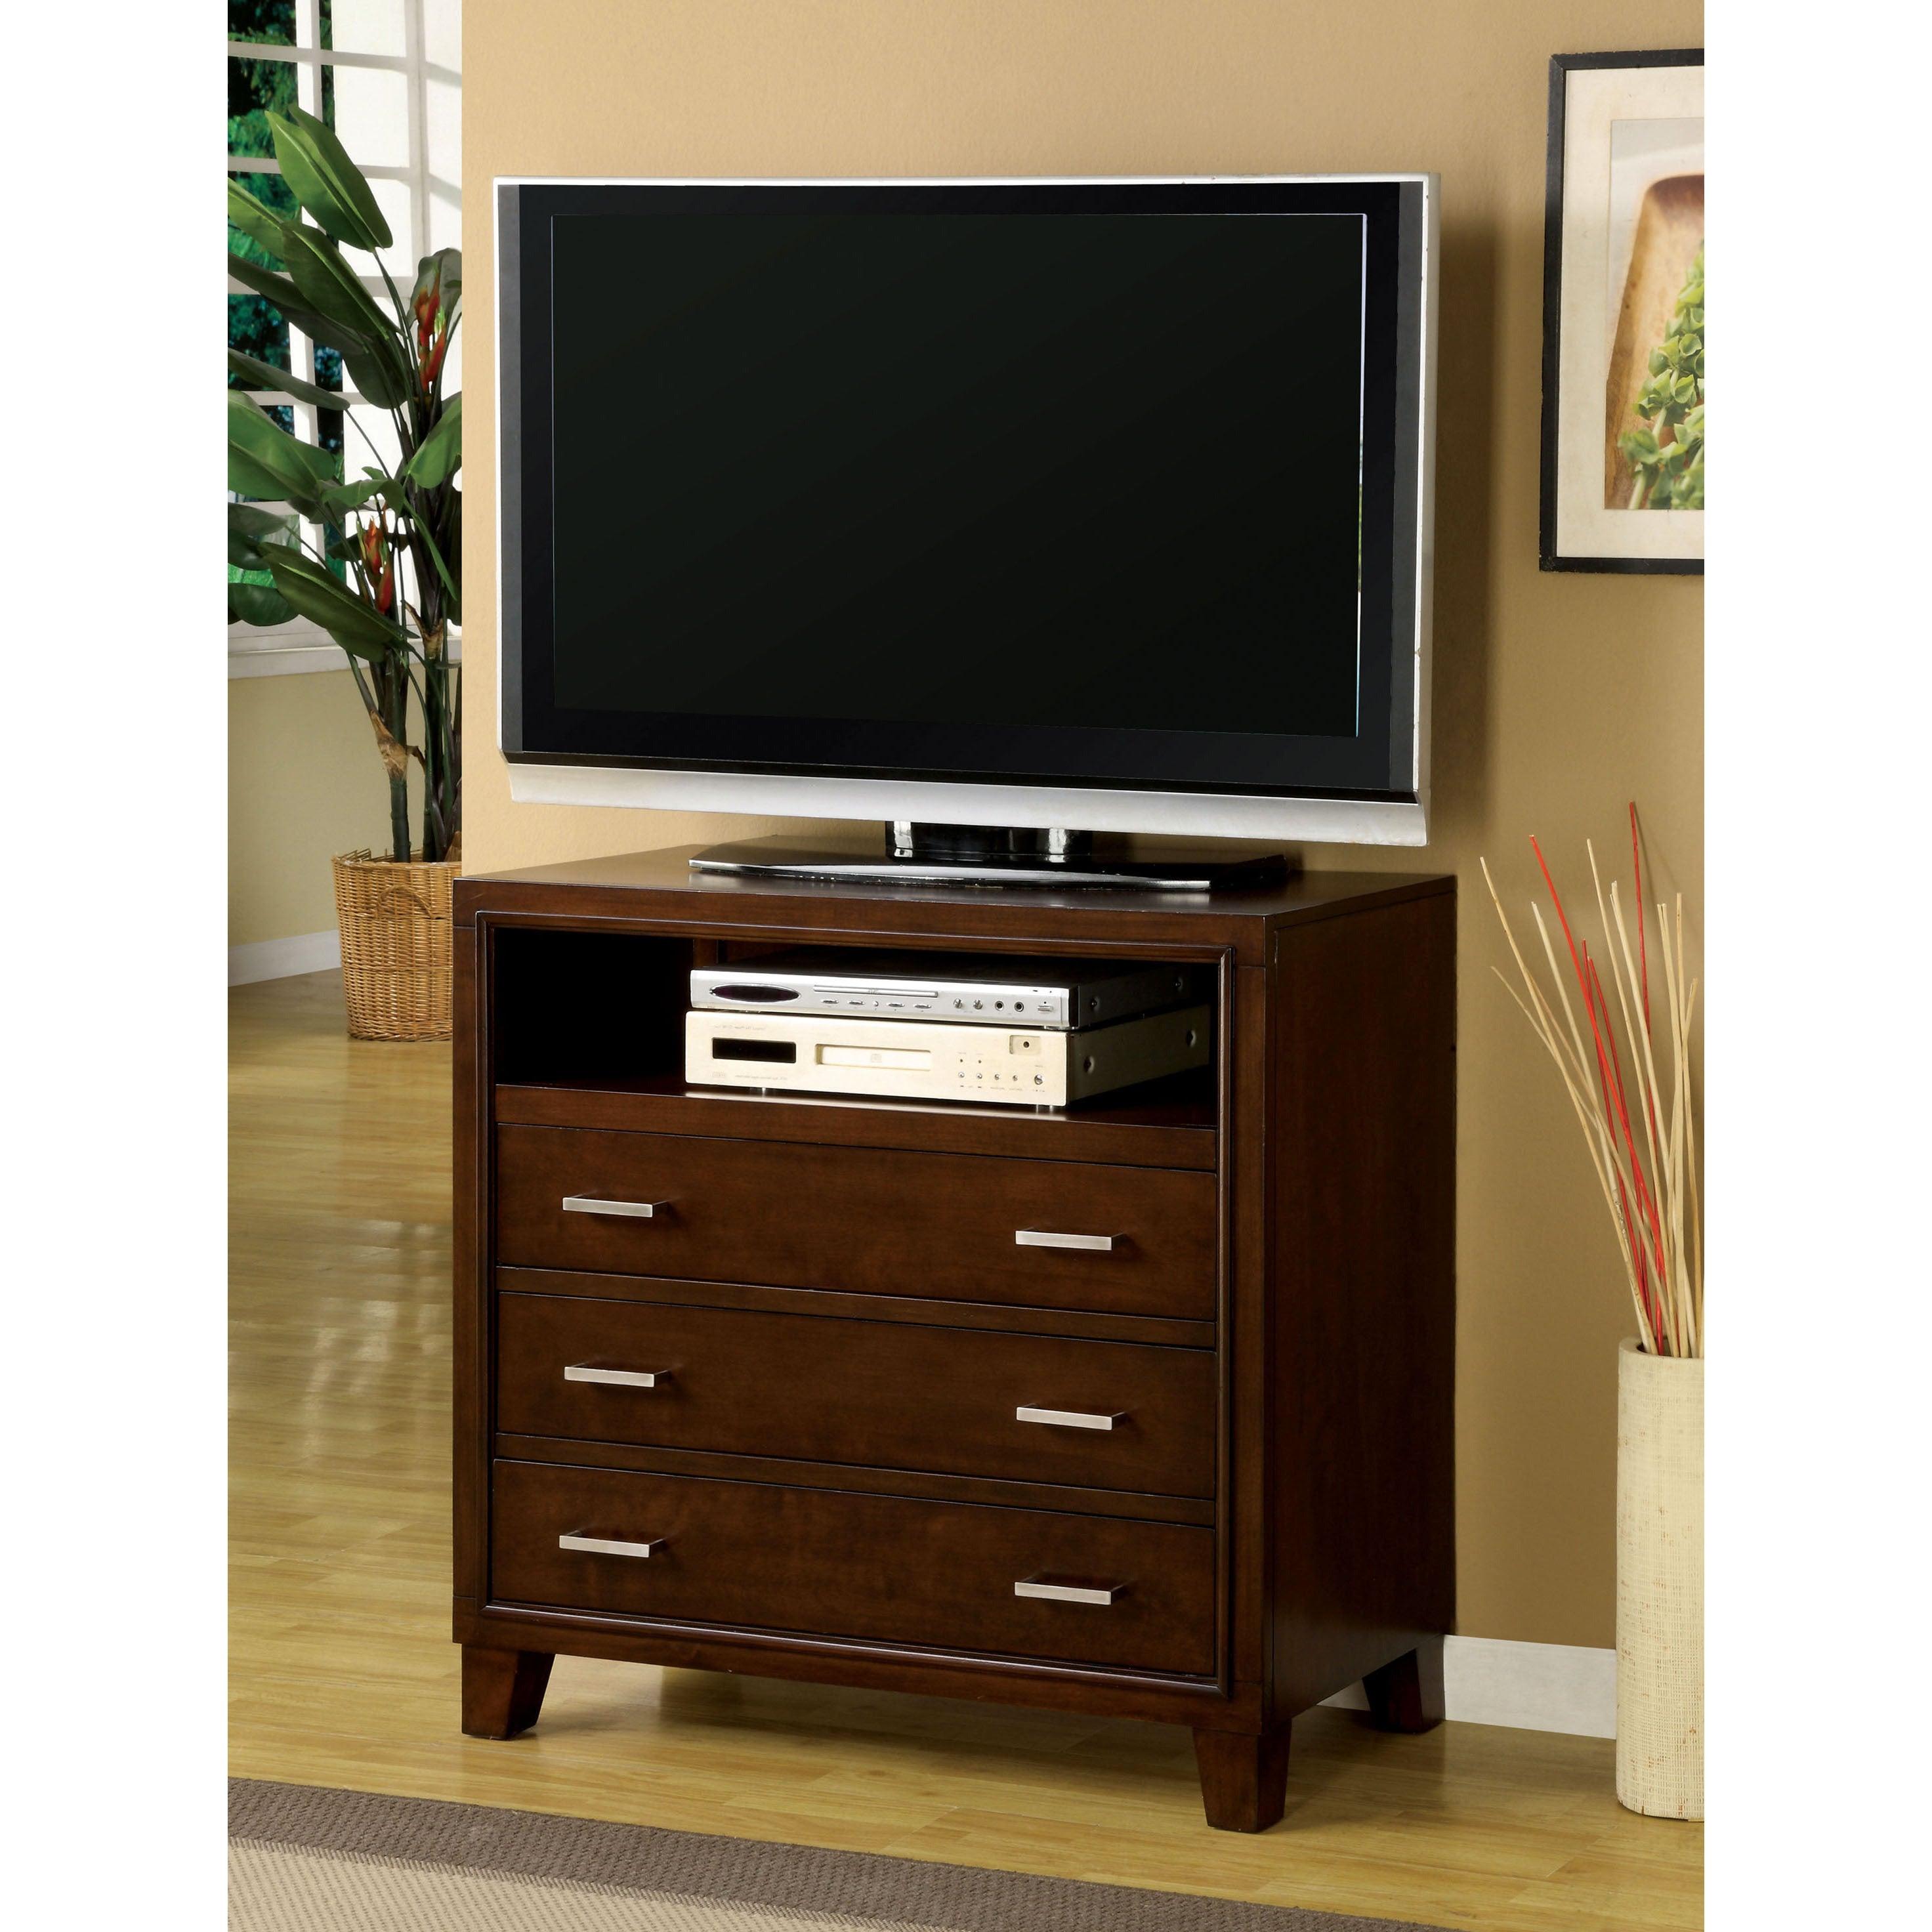 Furniture of America Sunjan Brown Cherry 3-Drawer Media C...